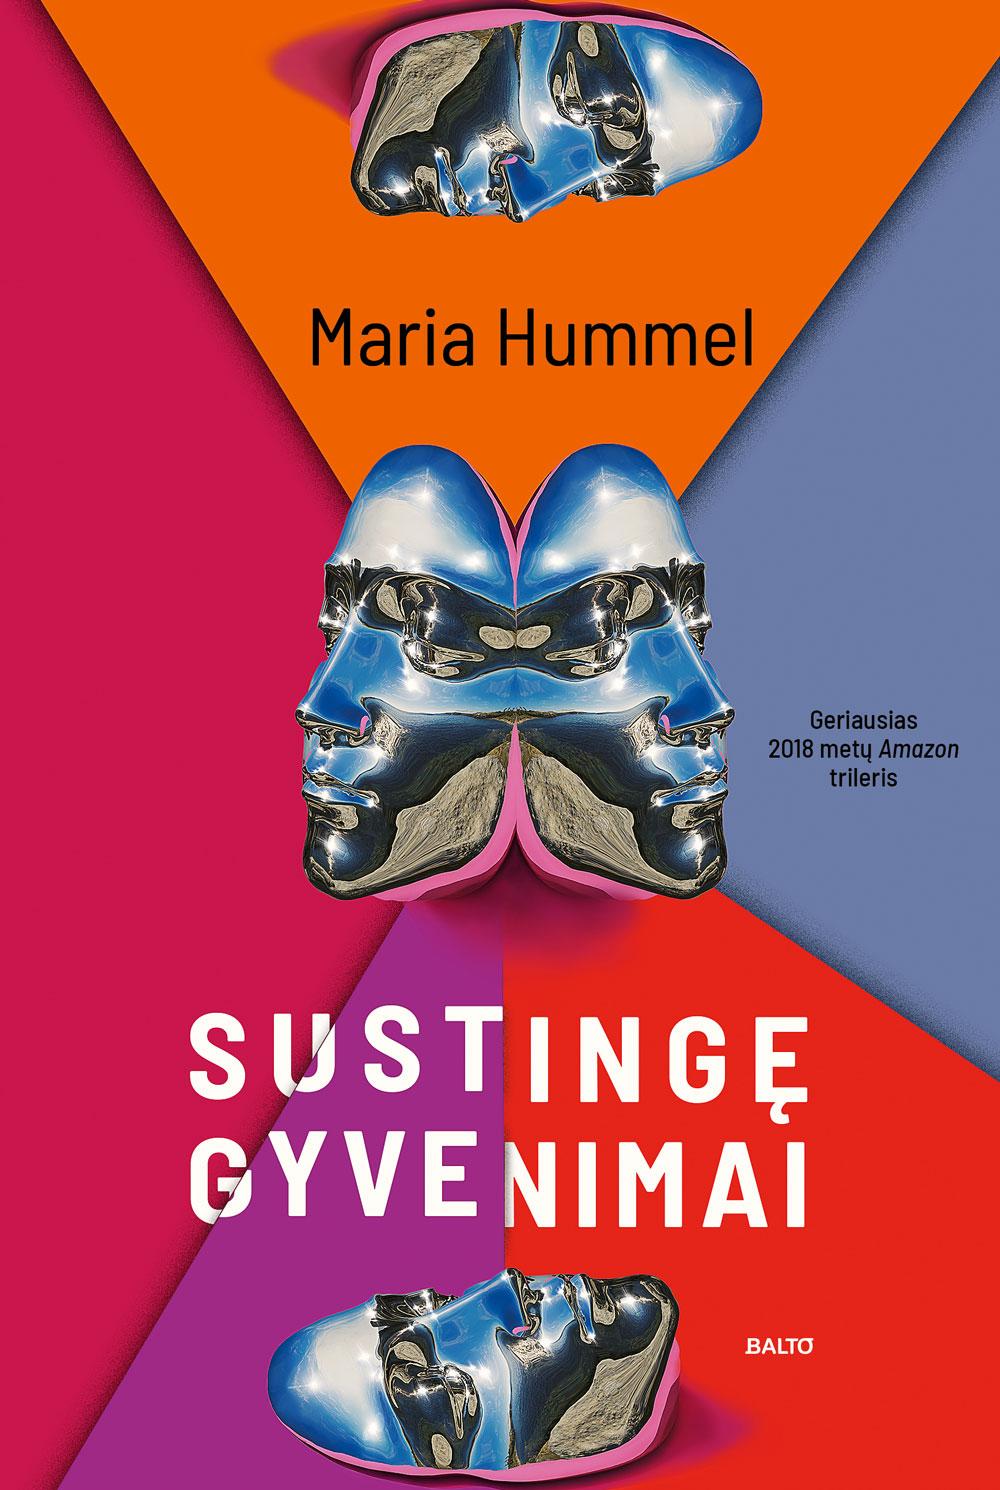 Balto leidybos namai - Sustingę gyvenimai - Maria Hummel